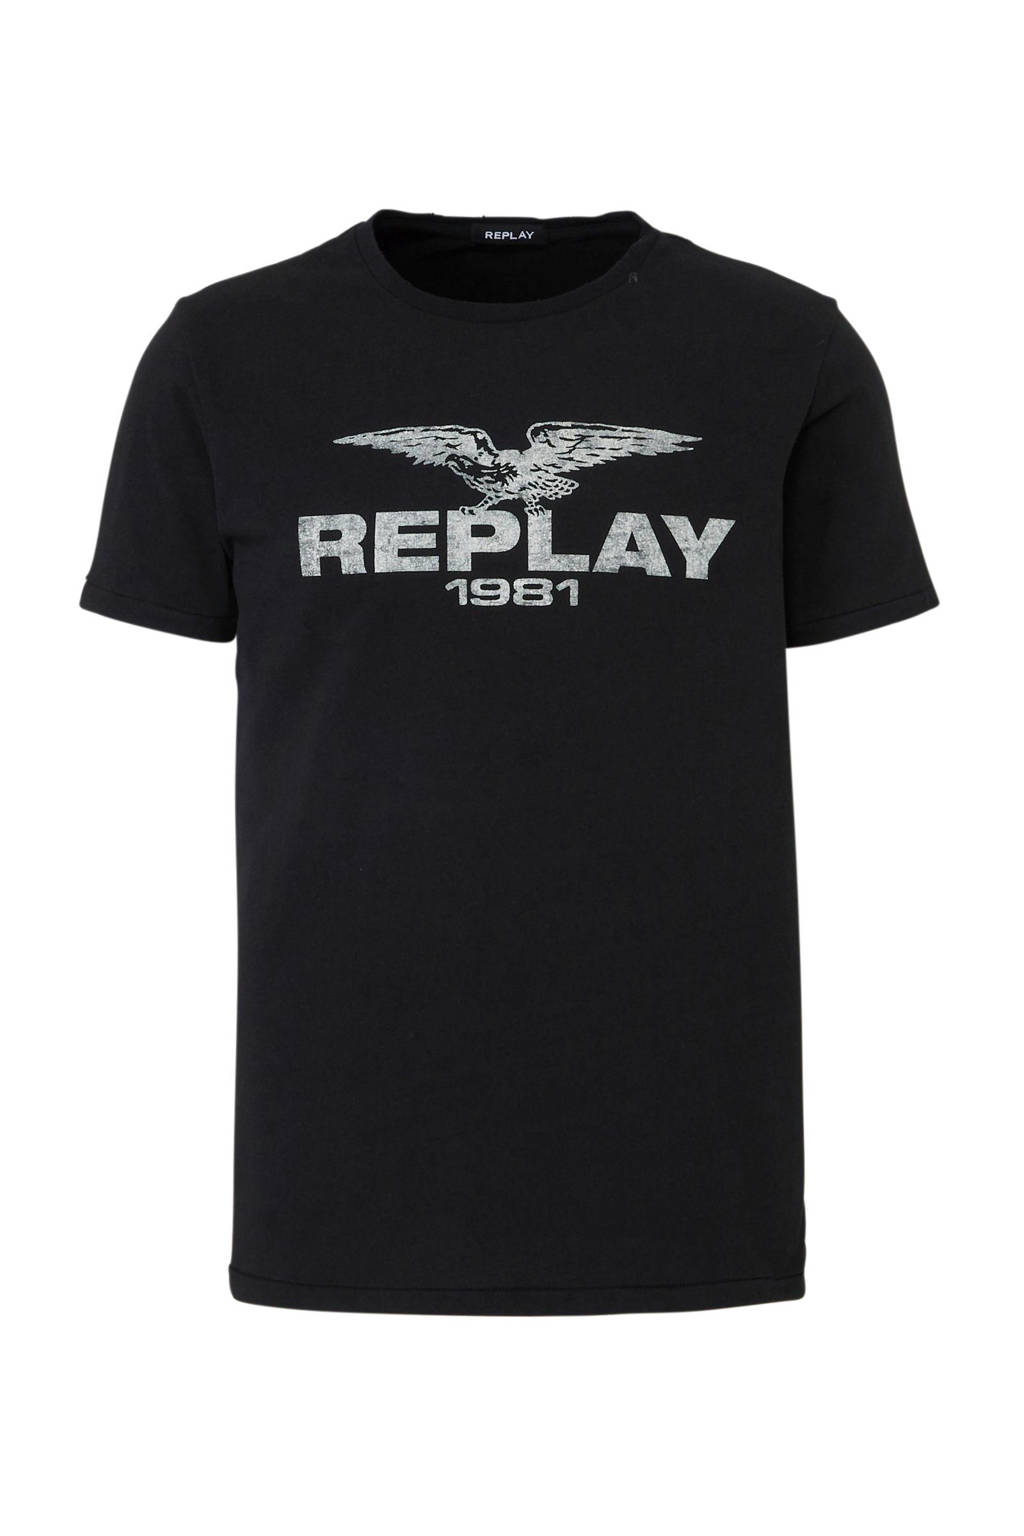 REPLAY T-shirt met logo, Zwart